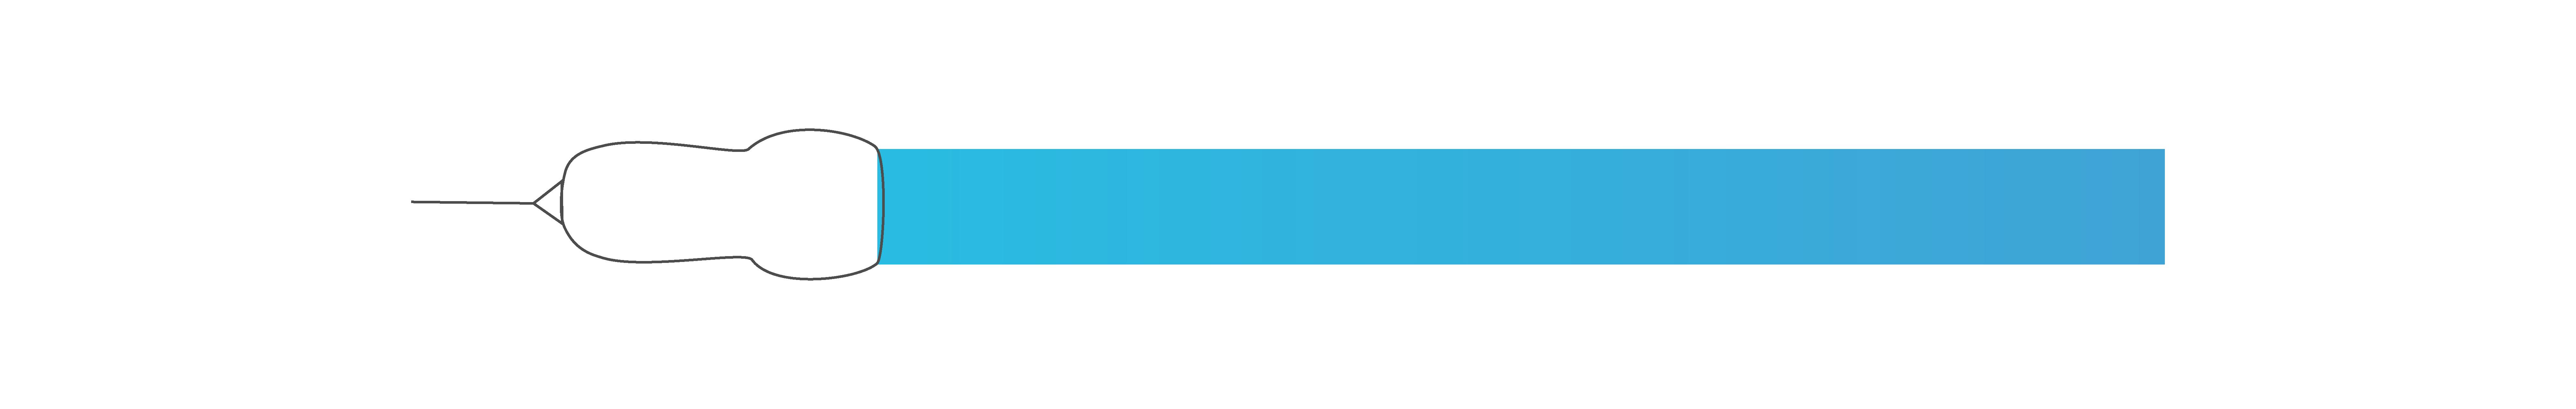 UCSD Website Logo Design-34